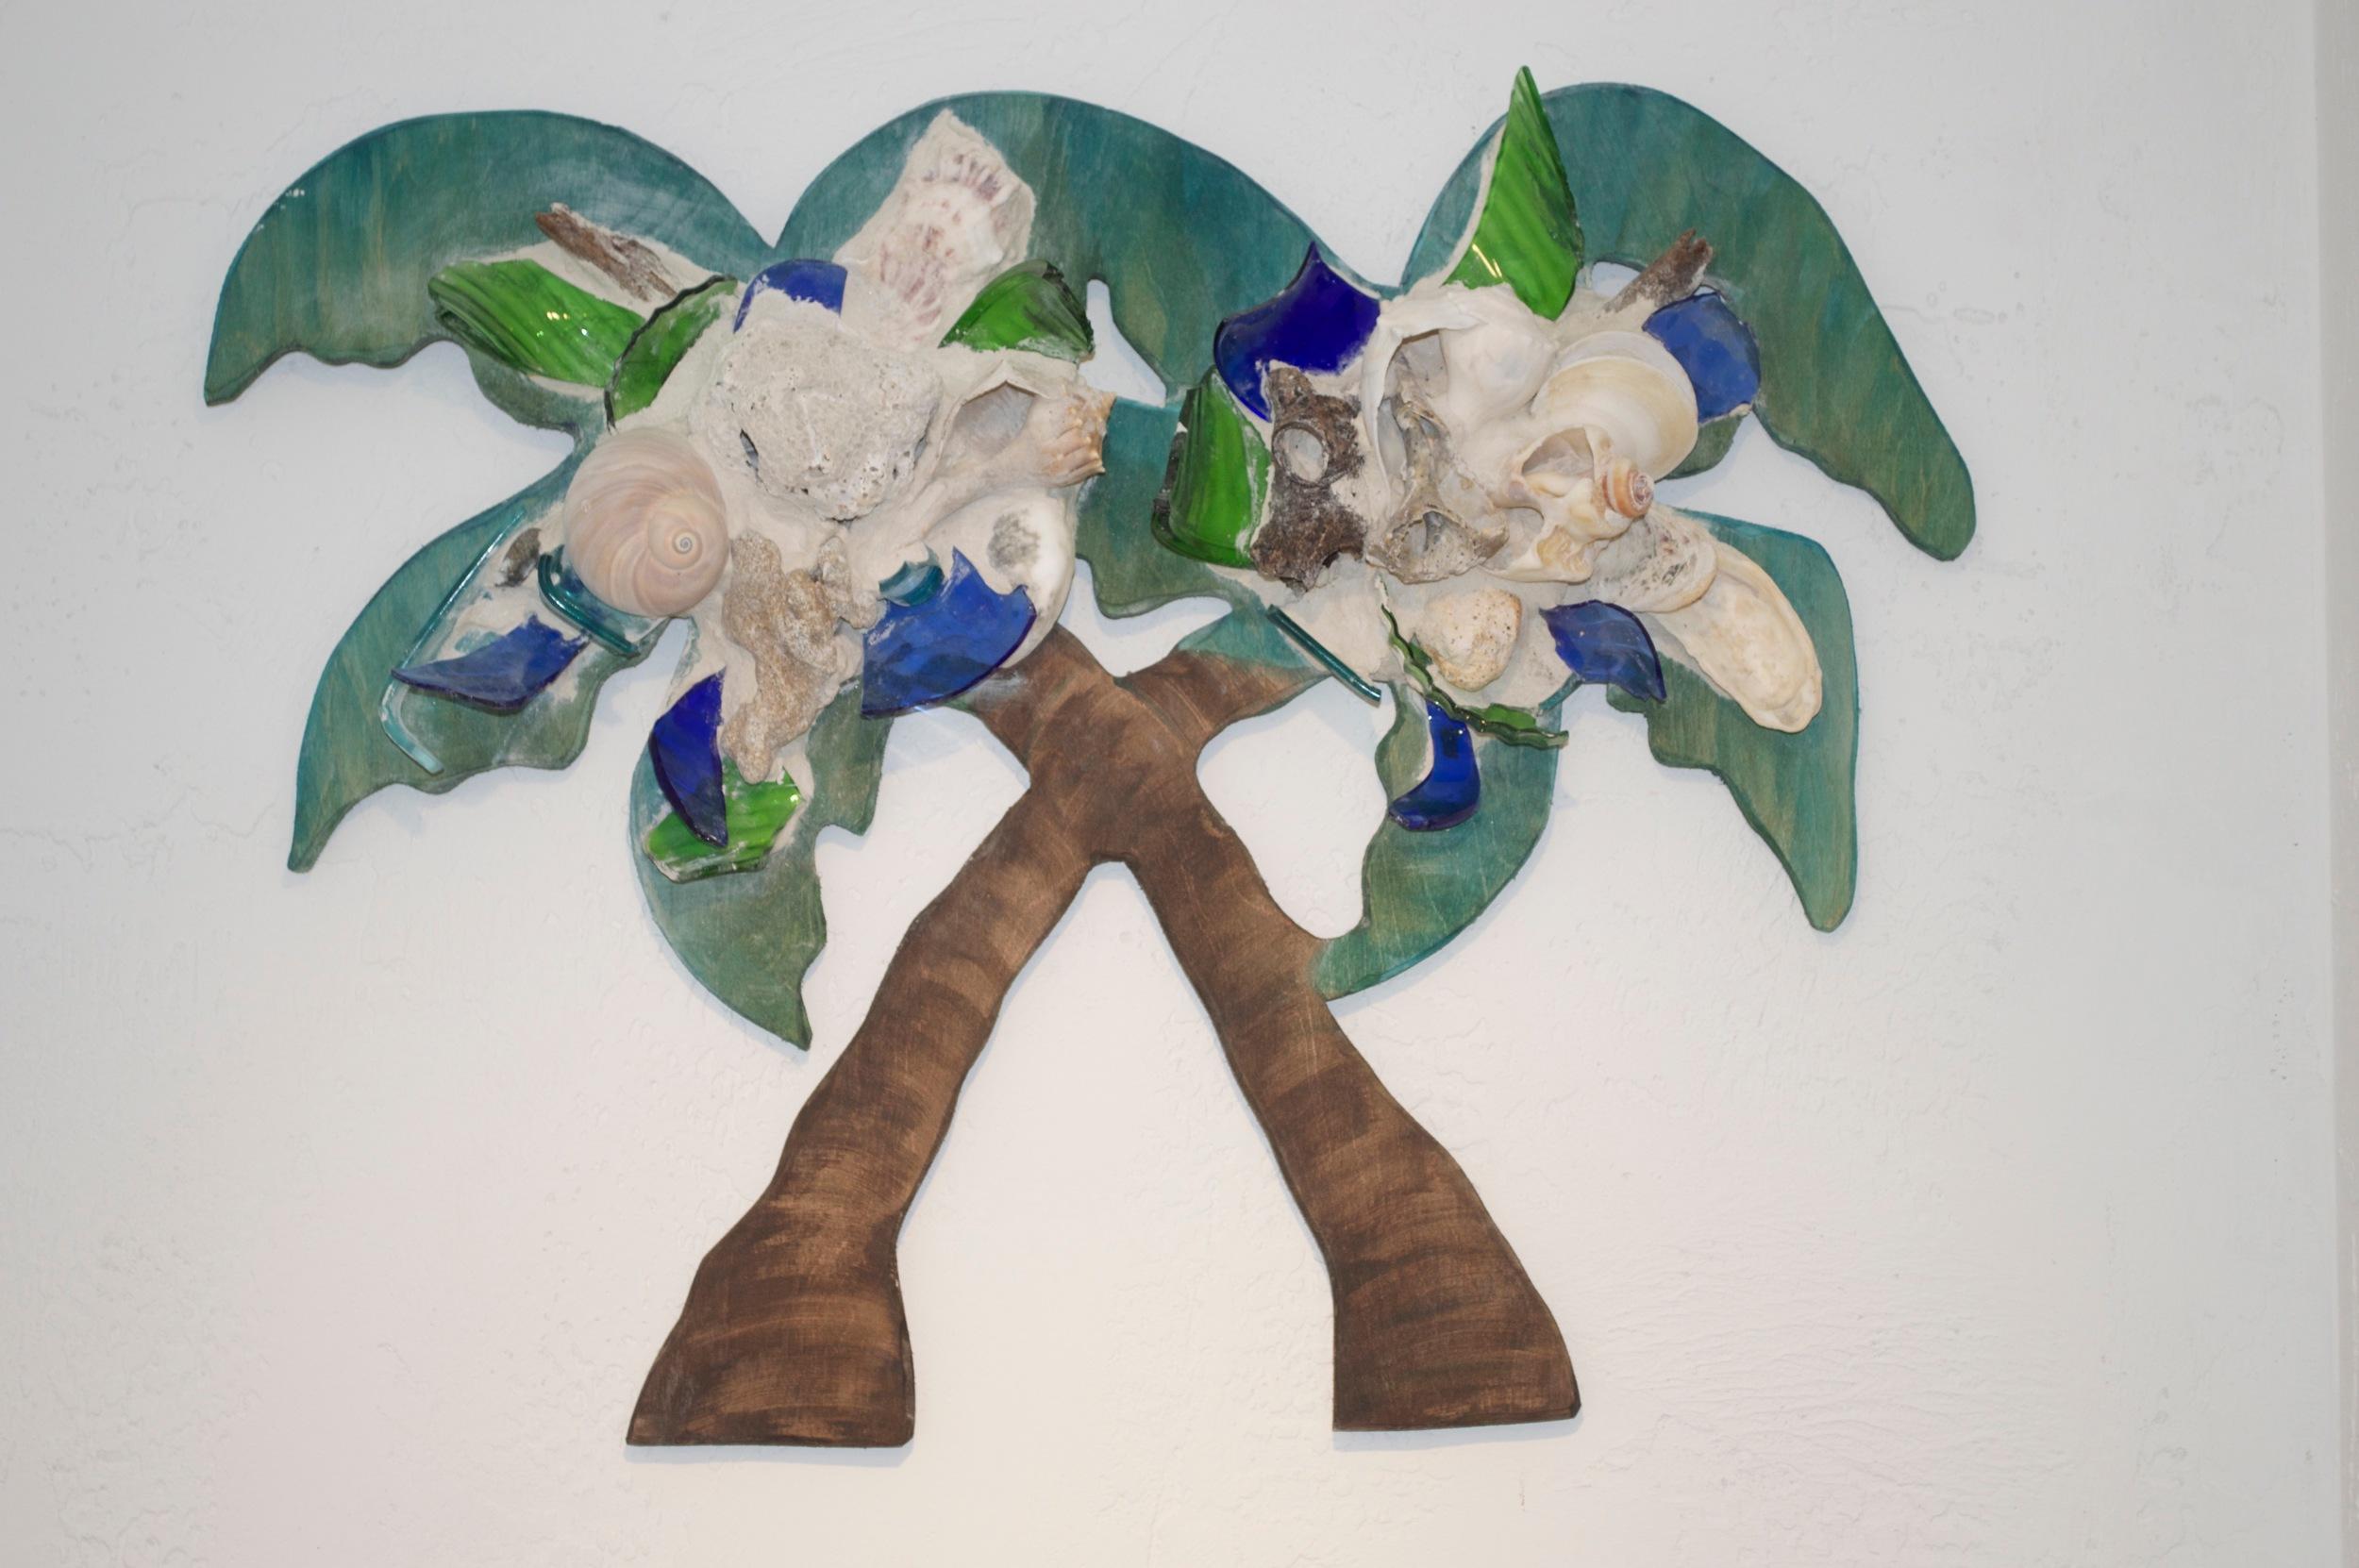 "Beach Art - Double Palm - wood, glass, beach objects - 25"" x 20"" - $149"